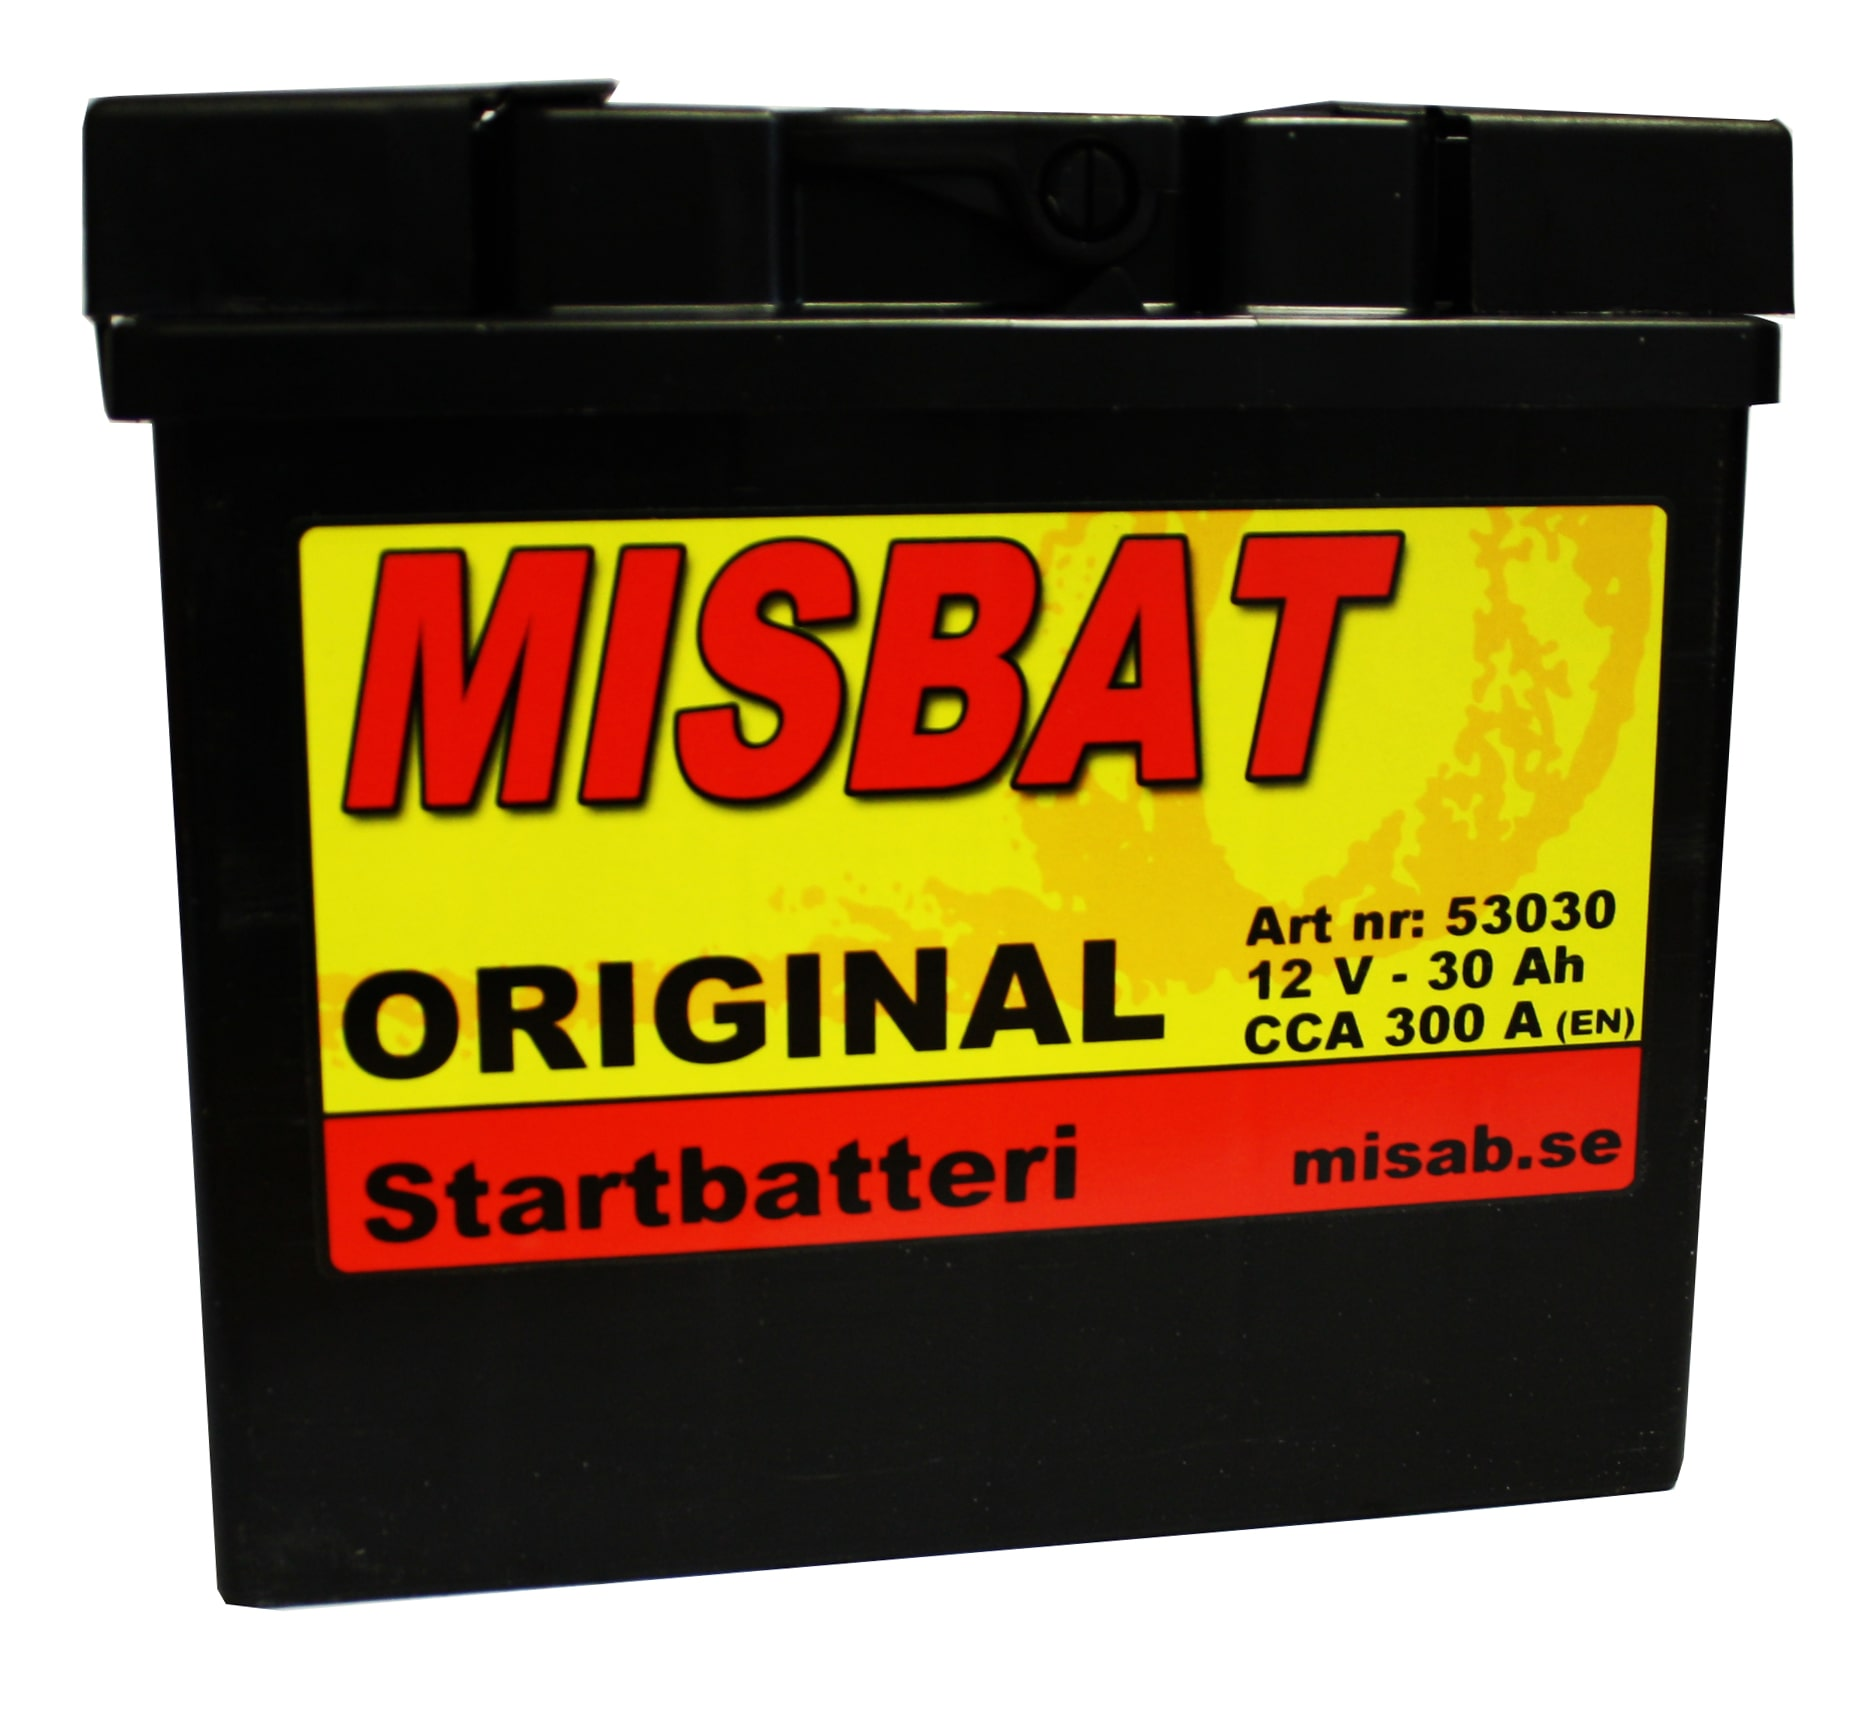 MISBAT MC 30 AH